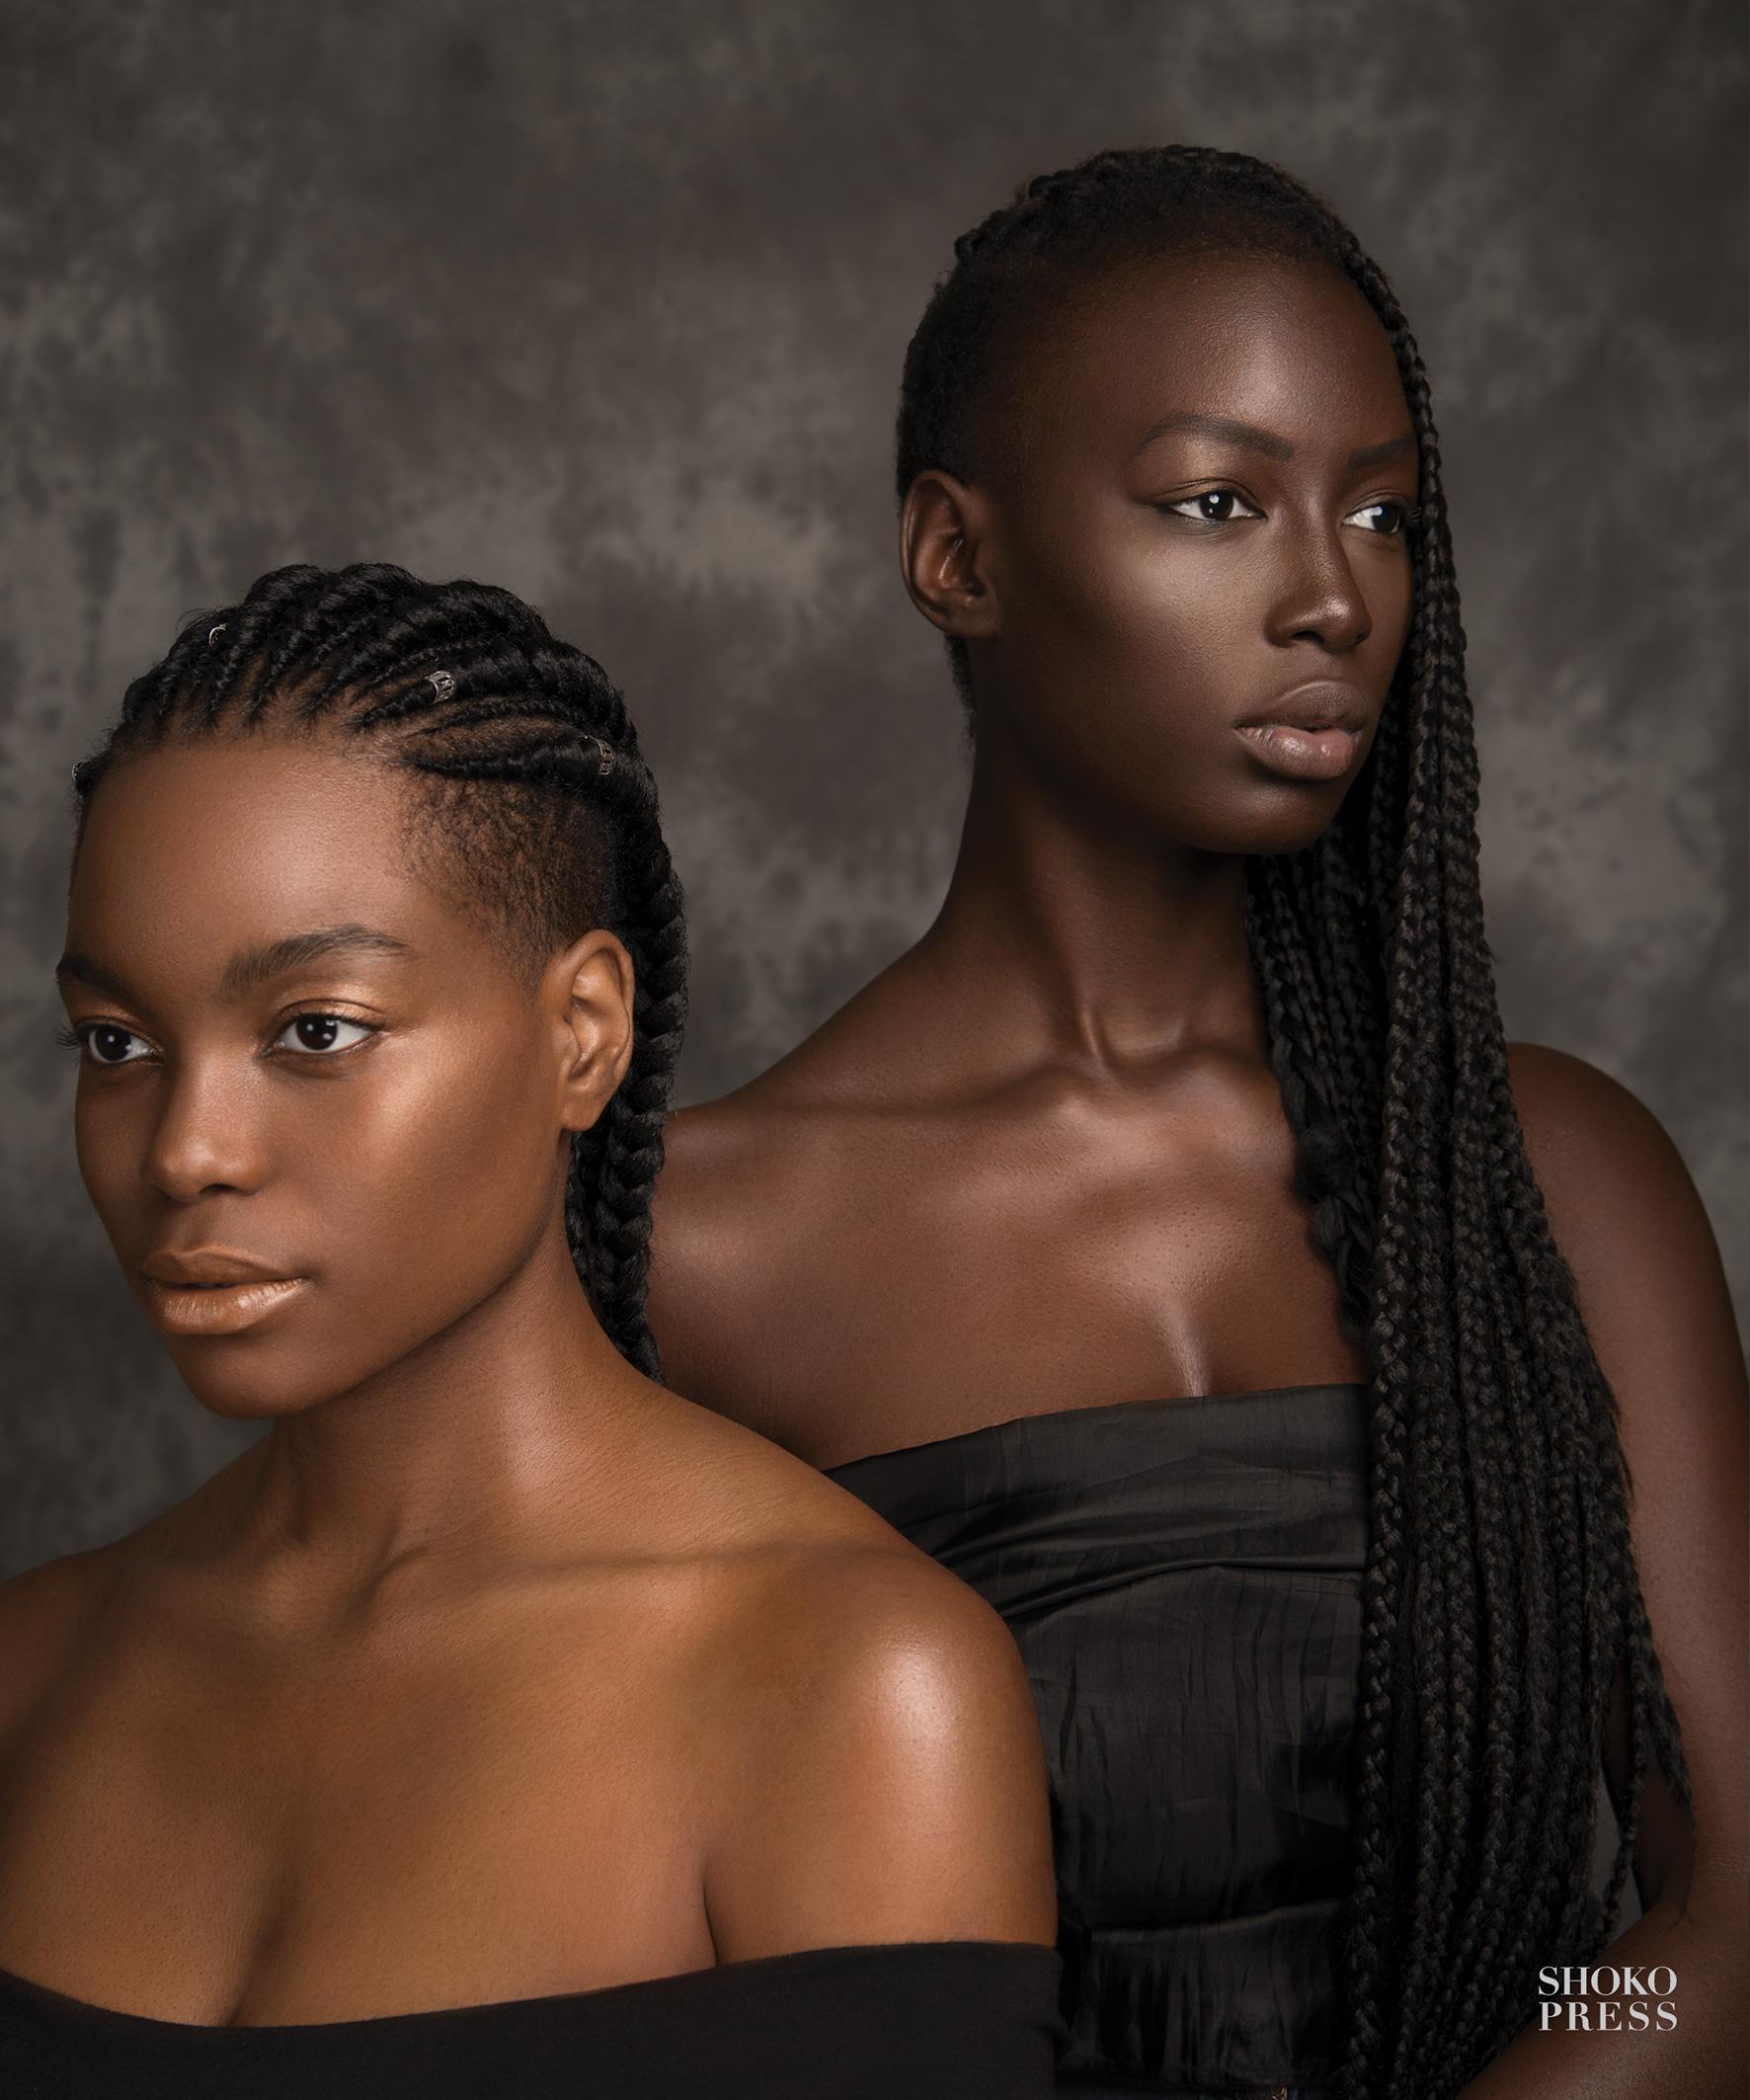 BEAUTIFUL Portraits of Black Beauty by photographer Mario Epanya published by Shoko Press